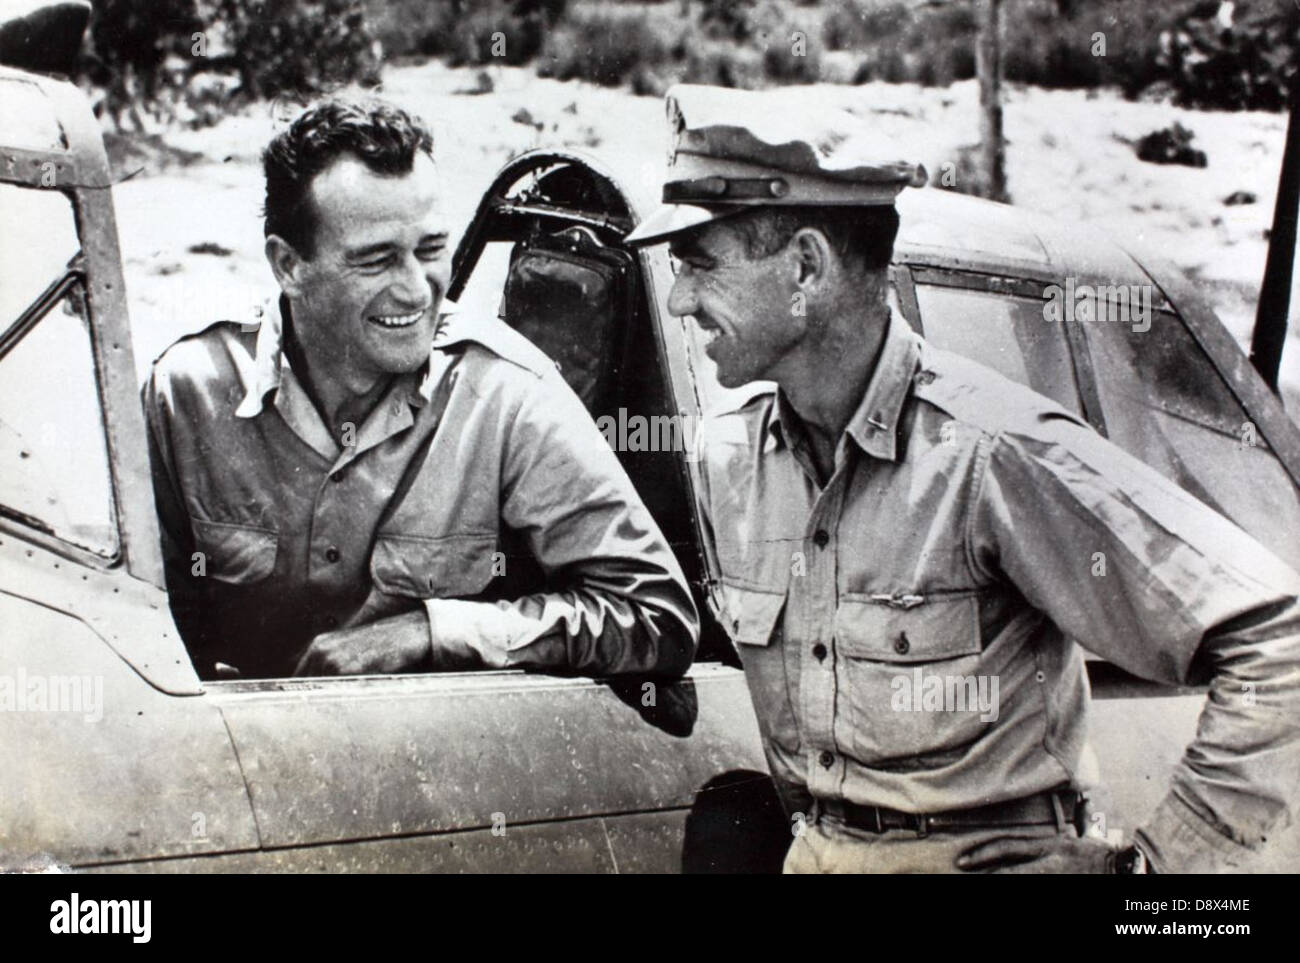 John Wayne and Col. Neel Kearby with P-47 at Saidor, New Guinea - Stock Image